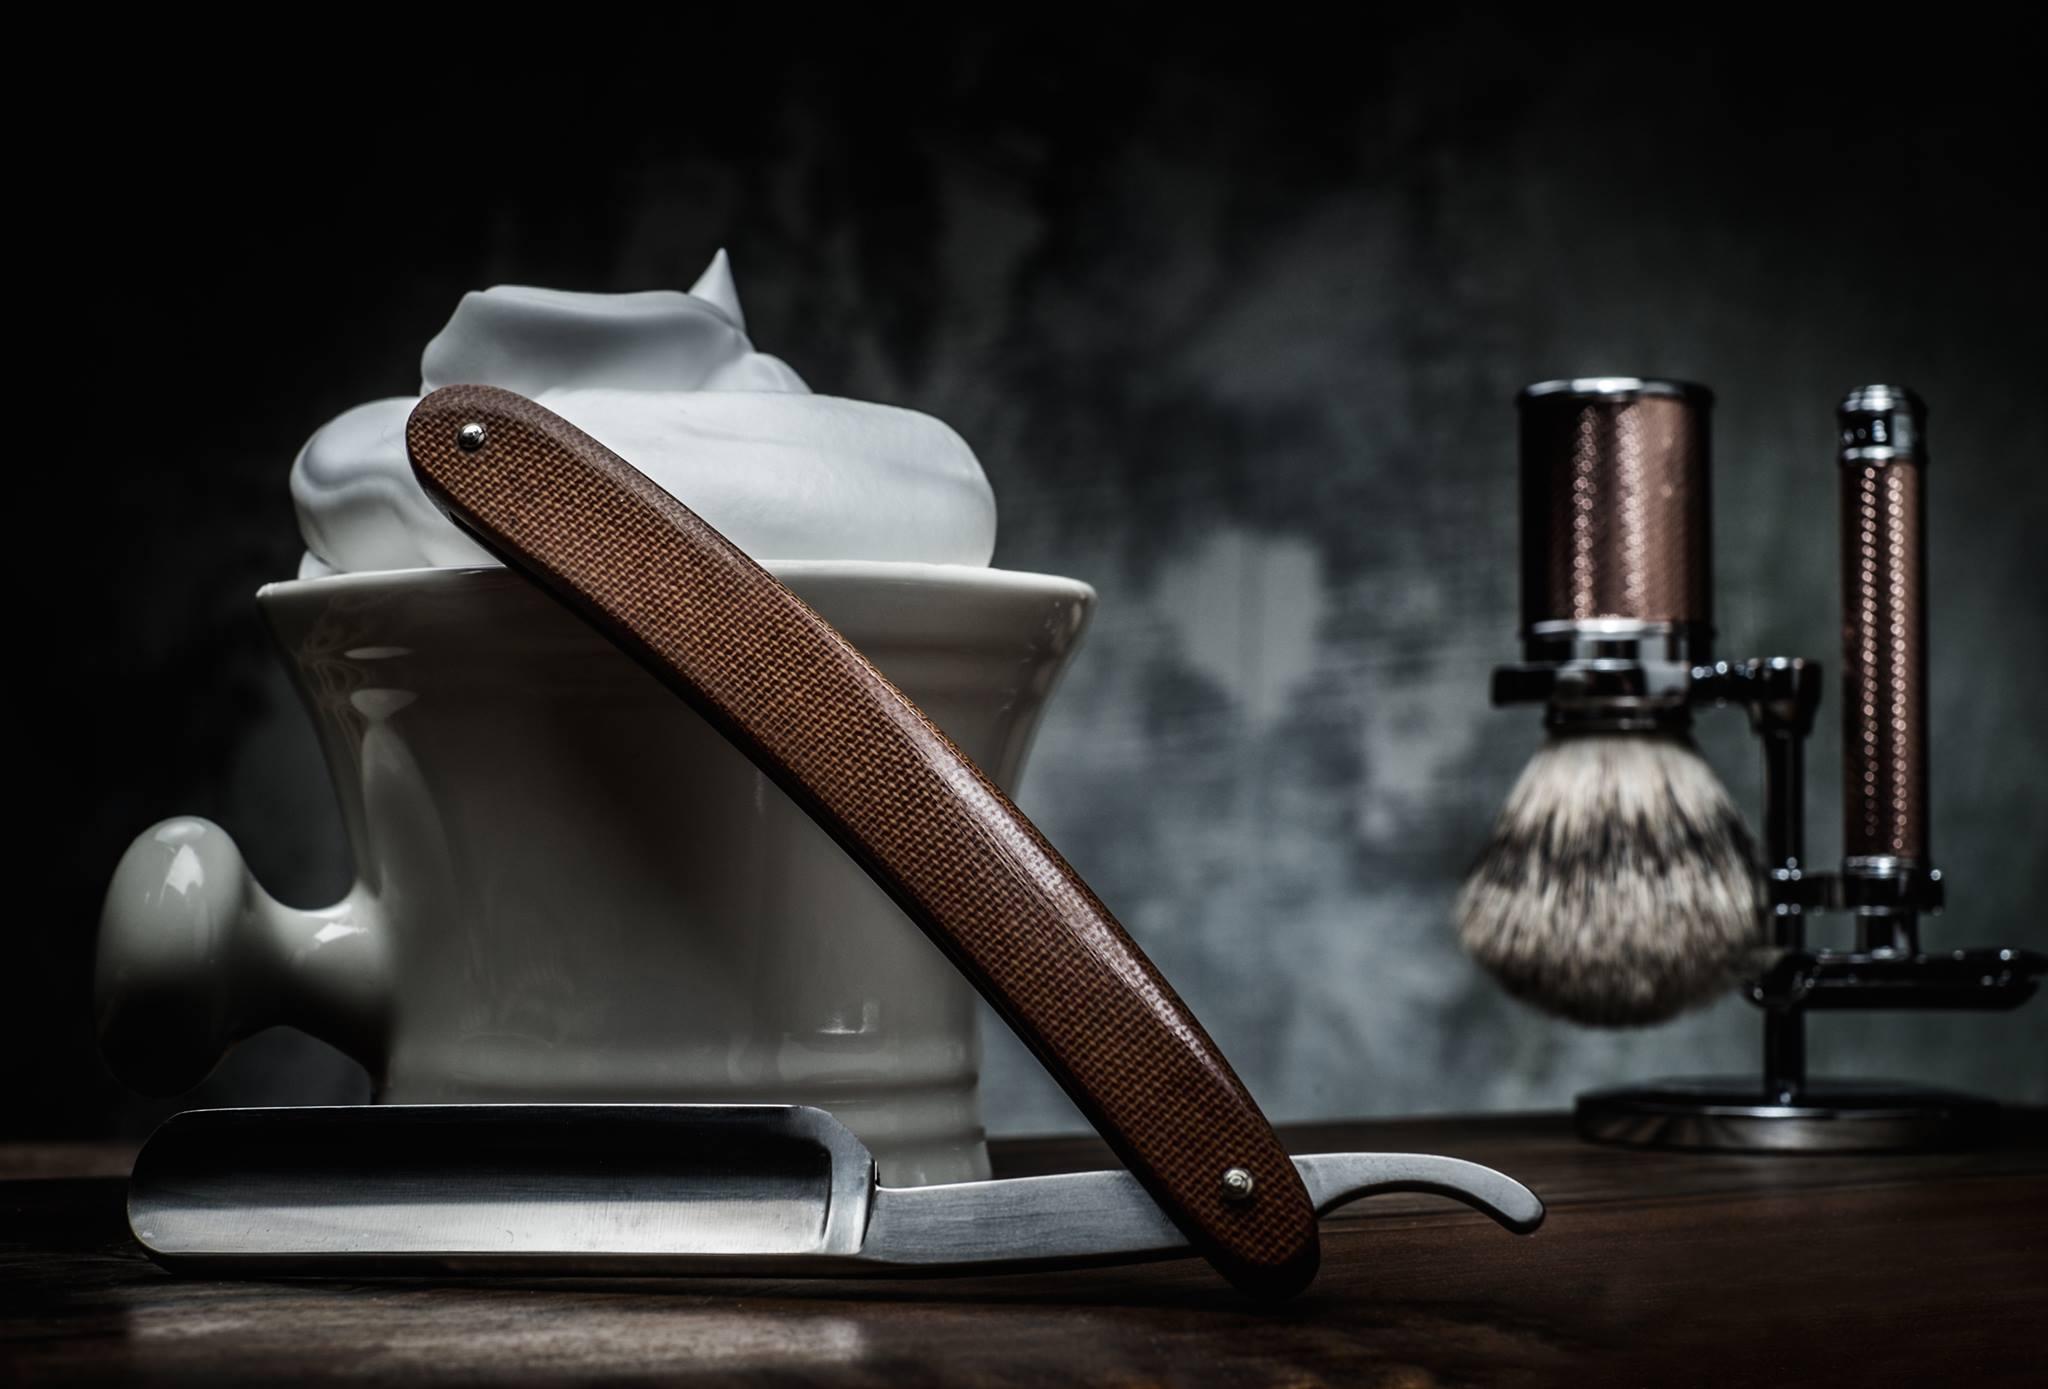 A razor, shaving foam and brush.